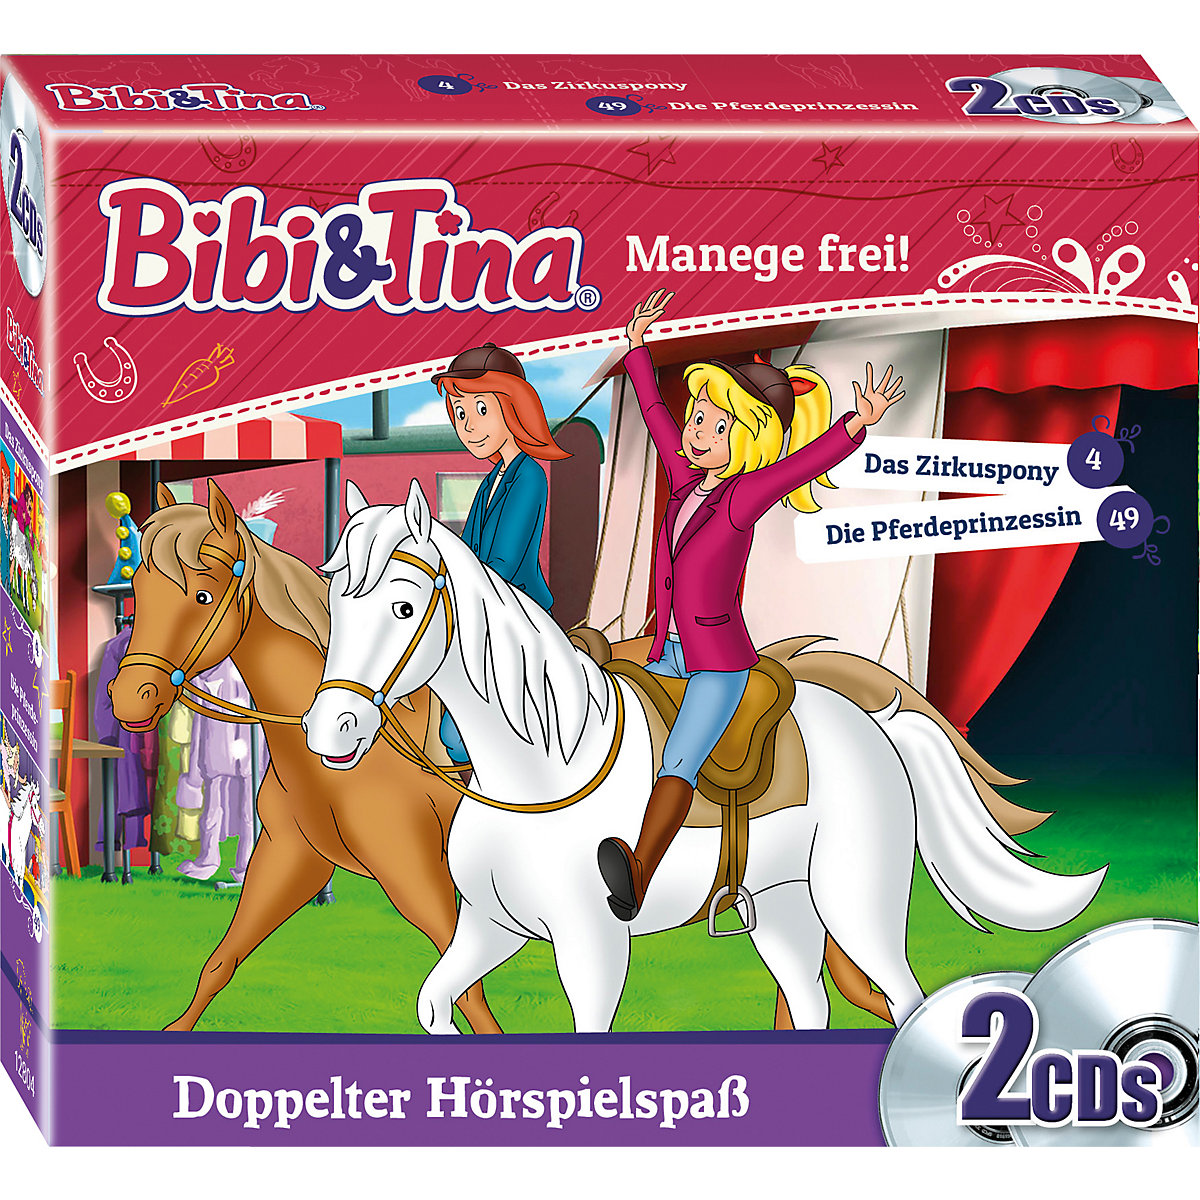 CD Bibi und Tina - Manege frei (Folgen 4 & 49 2 CDs) Bibi und Tina 7c2jp